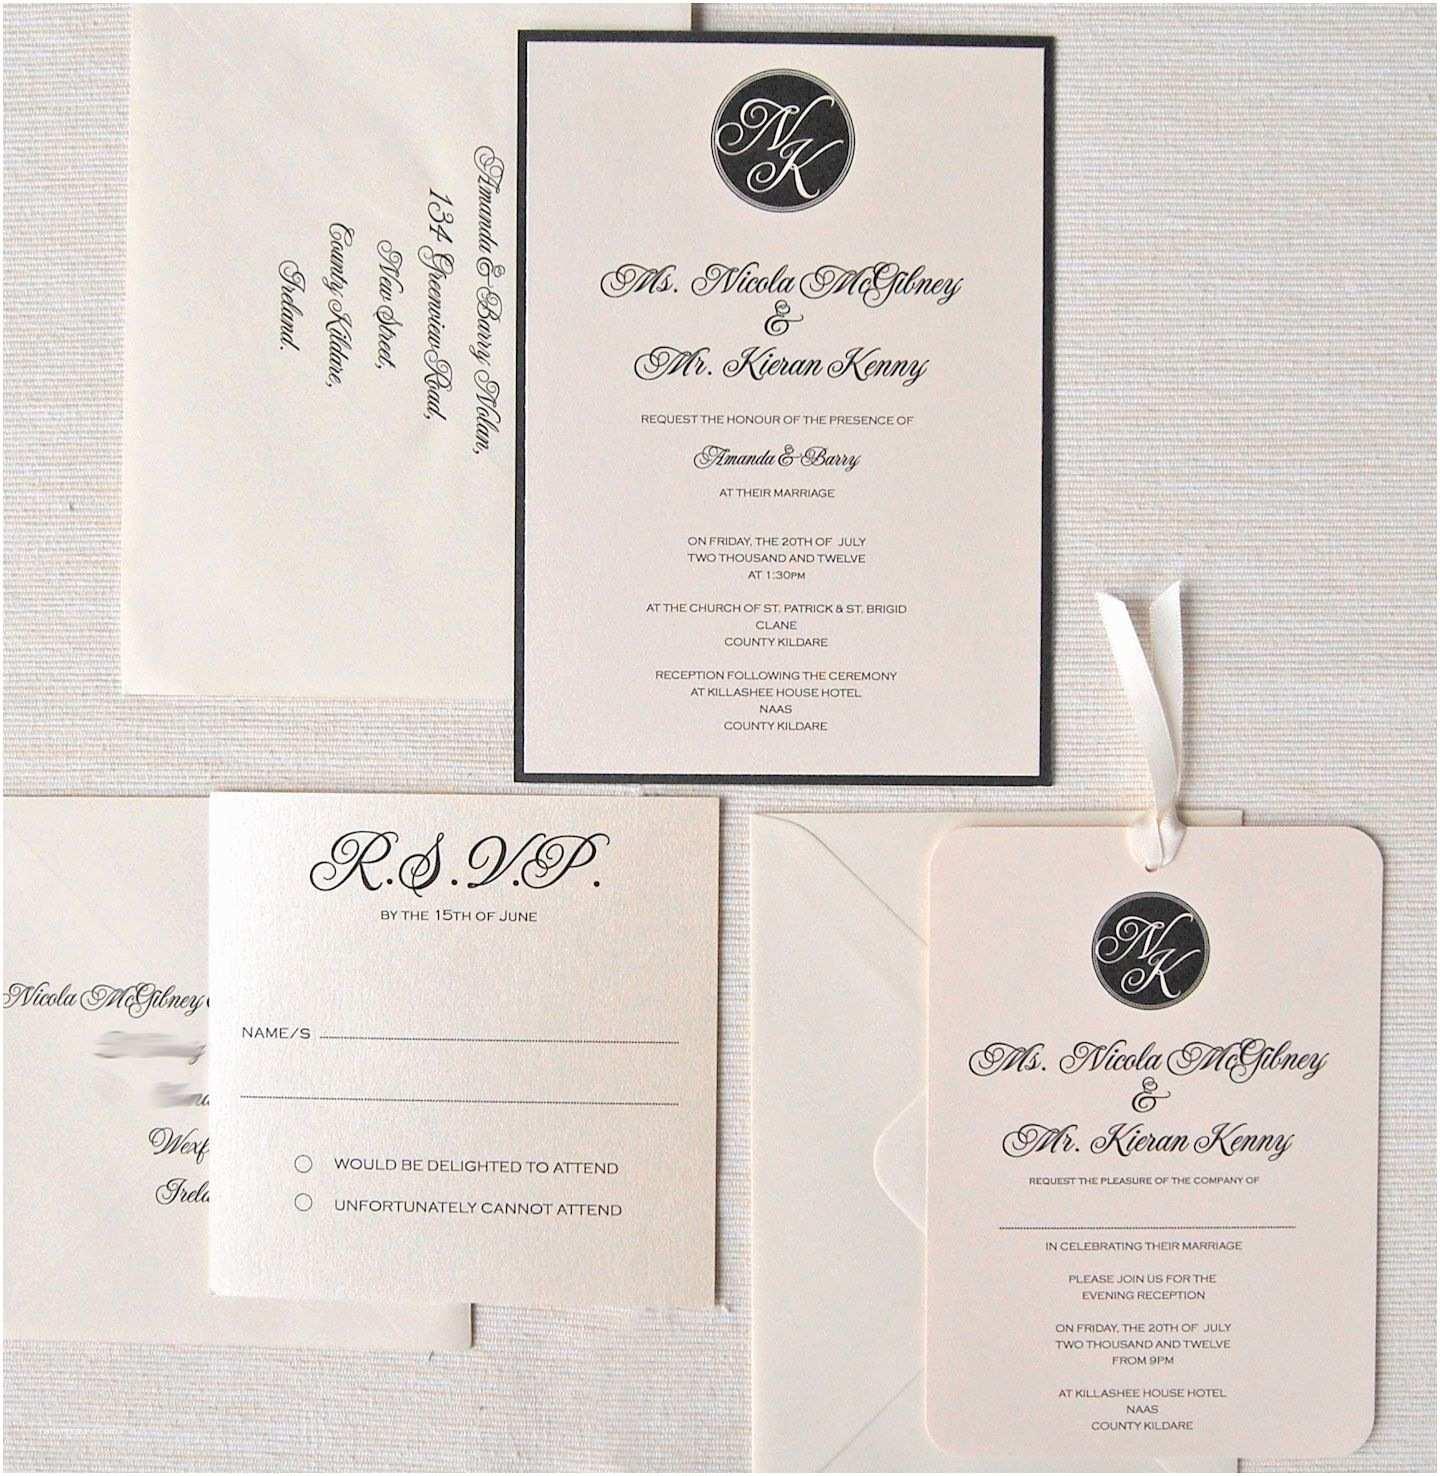 Wedding Invitation Rsvp Wording Samples Wedding Invitations Response Cards Wedding Invitations